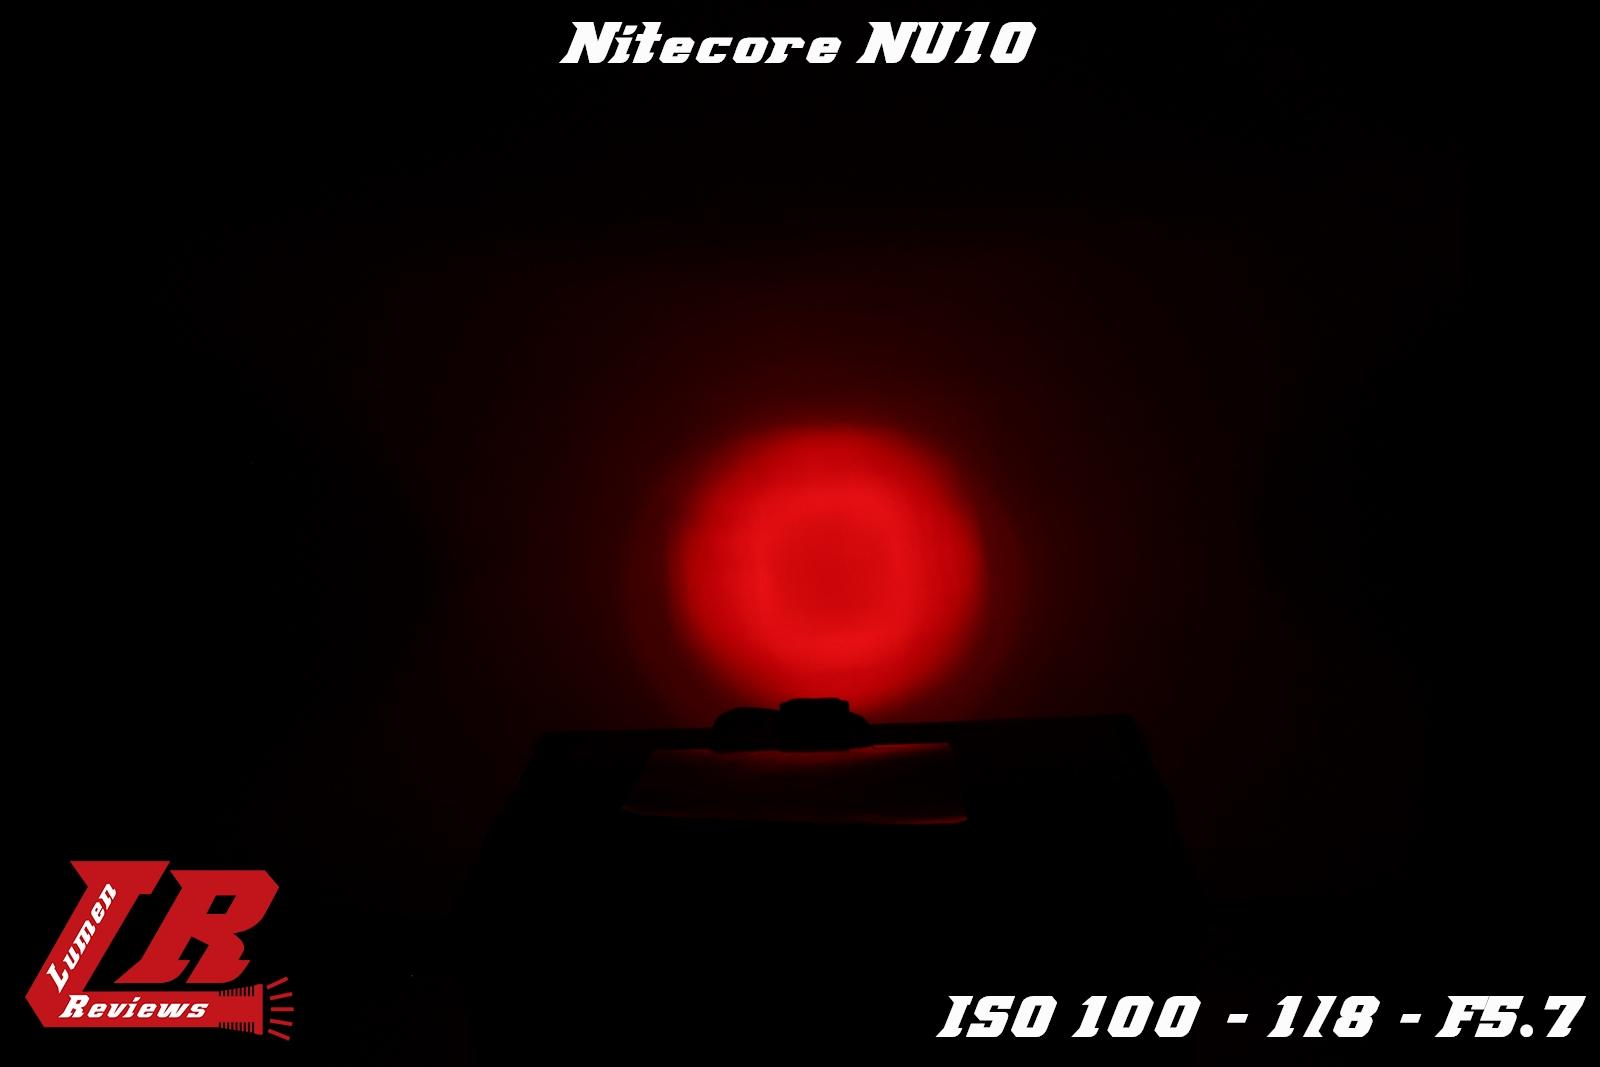 Nitecore NU10 14